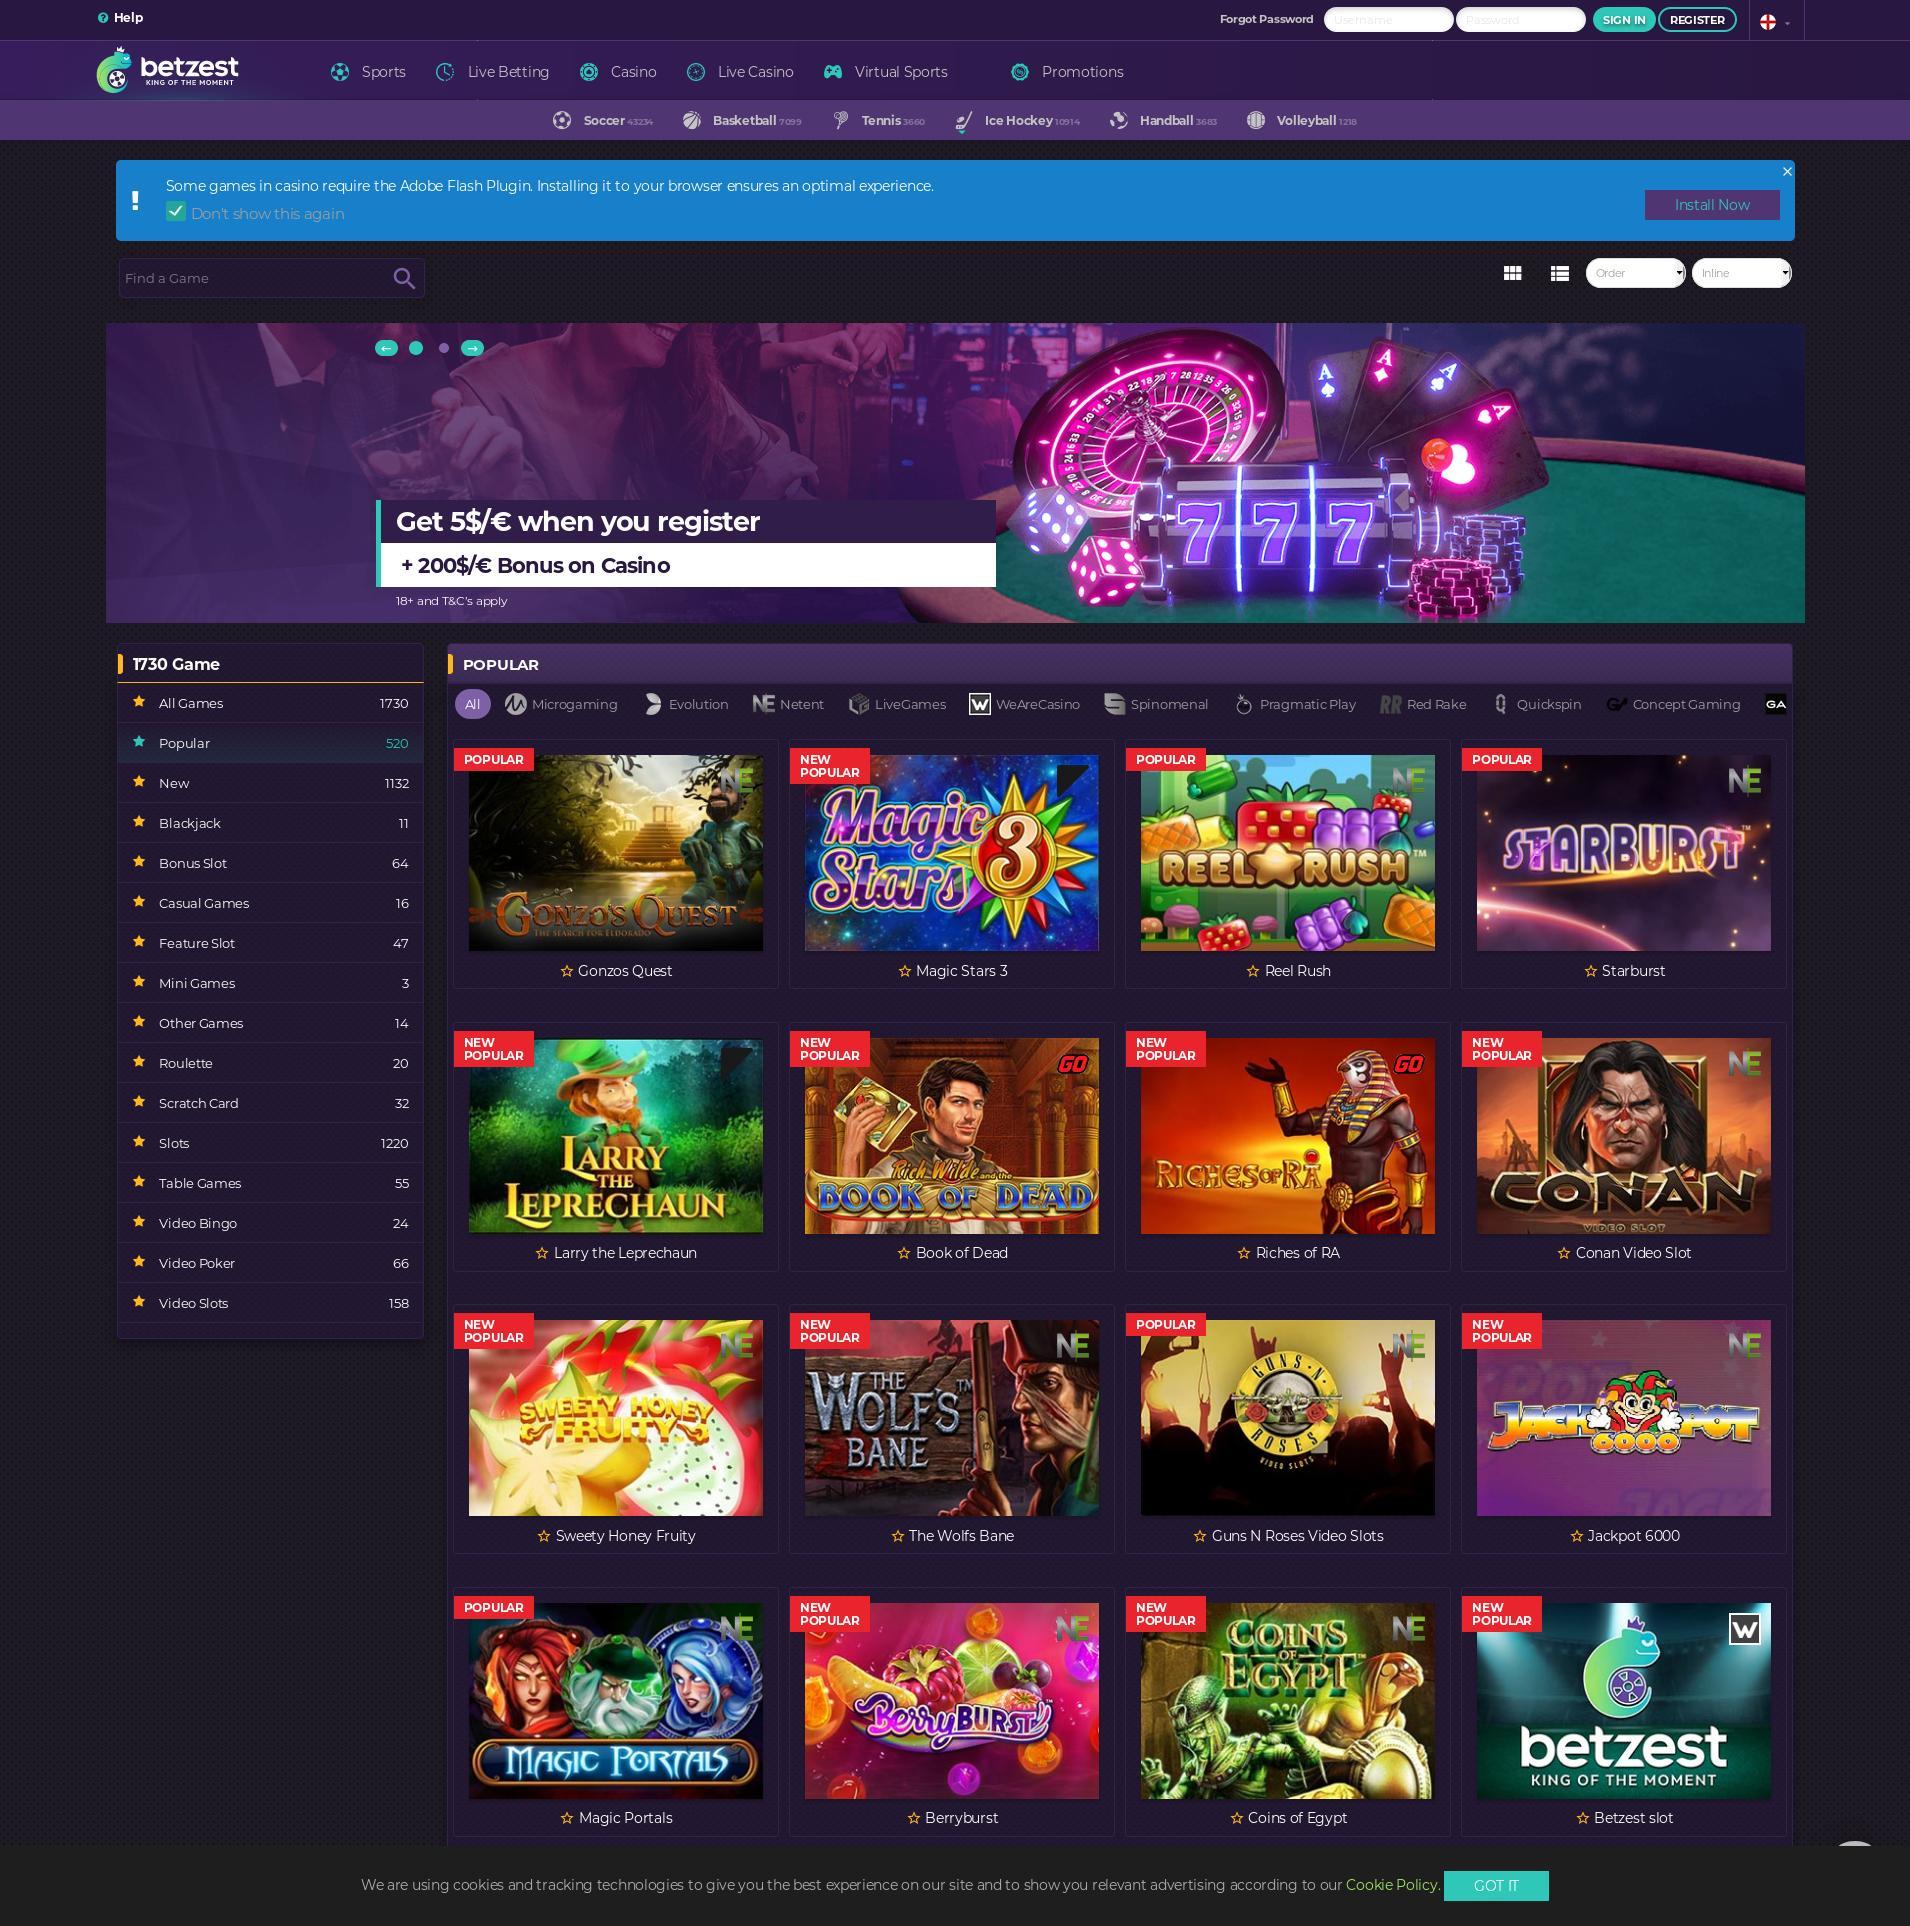 Casino screen Lobby 2019-11-13 for Germany